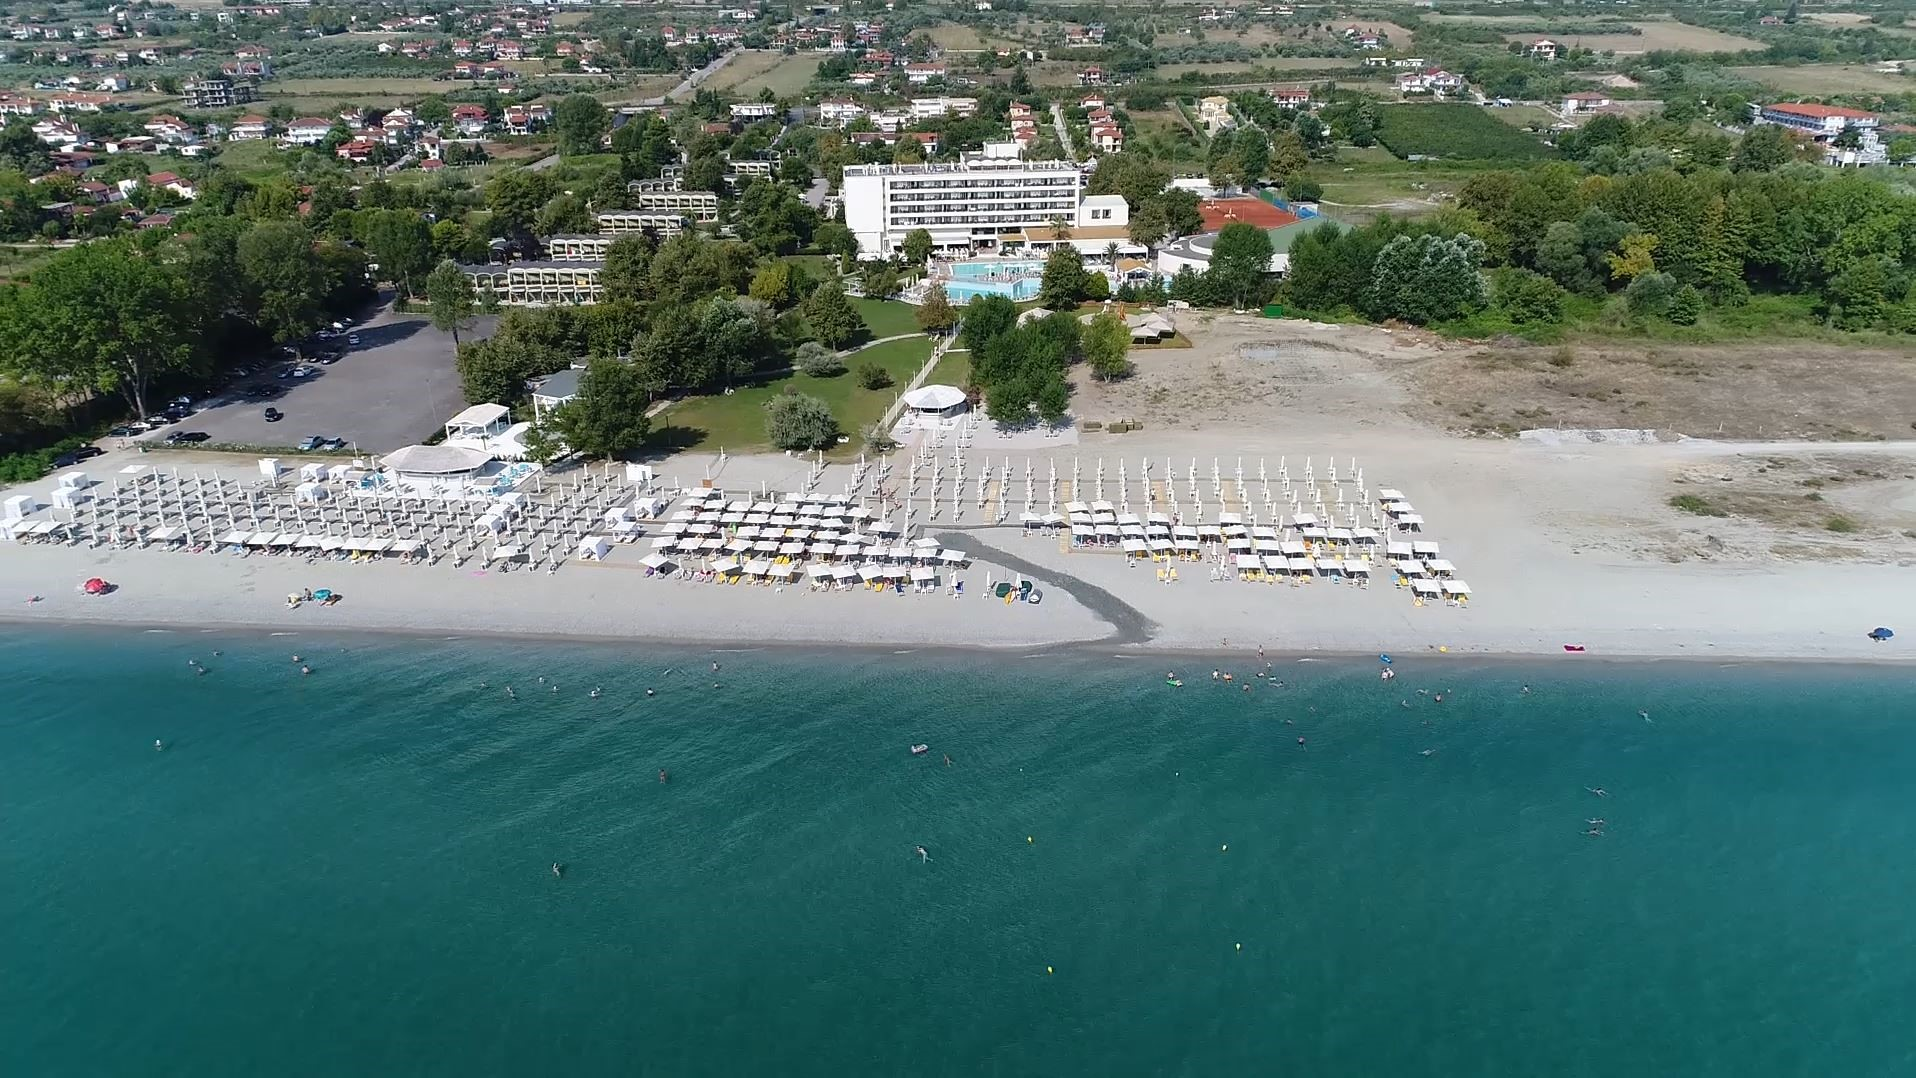 4* Bomo Olympus Grand Resort - Λεπτοκαρυά Πιερίας ✦ -40% ✦ 3 Ημέρες (2 Διανυκτερεύσεις) ✦ 2 άτομα + 1 παιδί έως 12 ετών ✦ All Inclusive ✦ 23/06/2021 έως 20/07/2021 ✦ Ξαπλώστρες και ομπρέλες στην πισίνα και στην παραλία